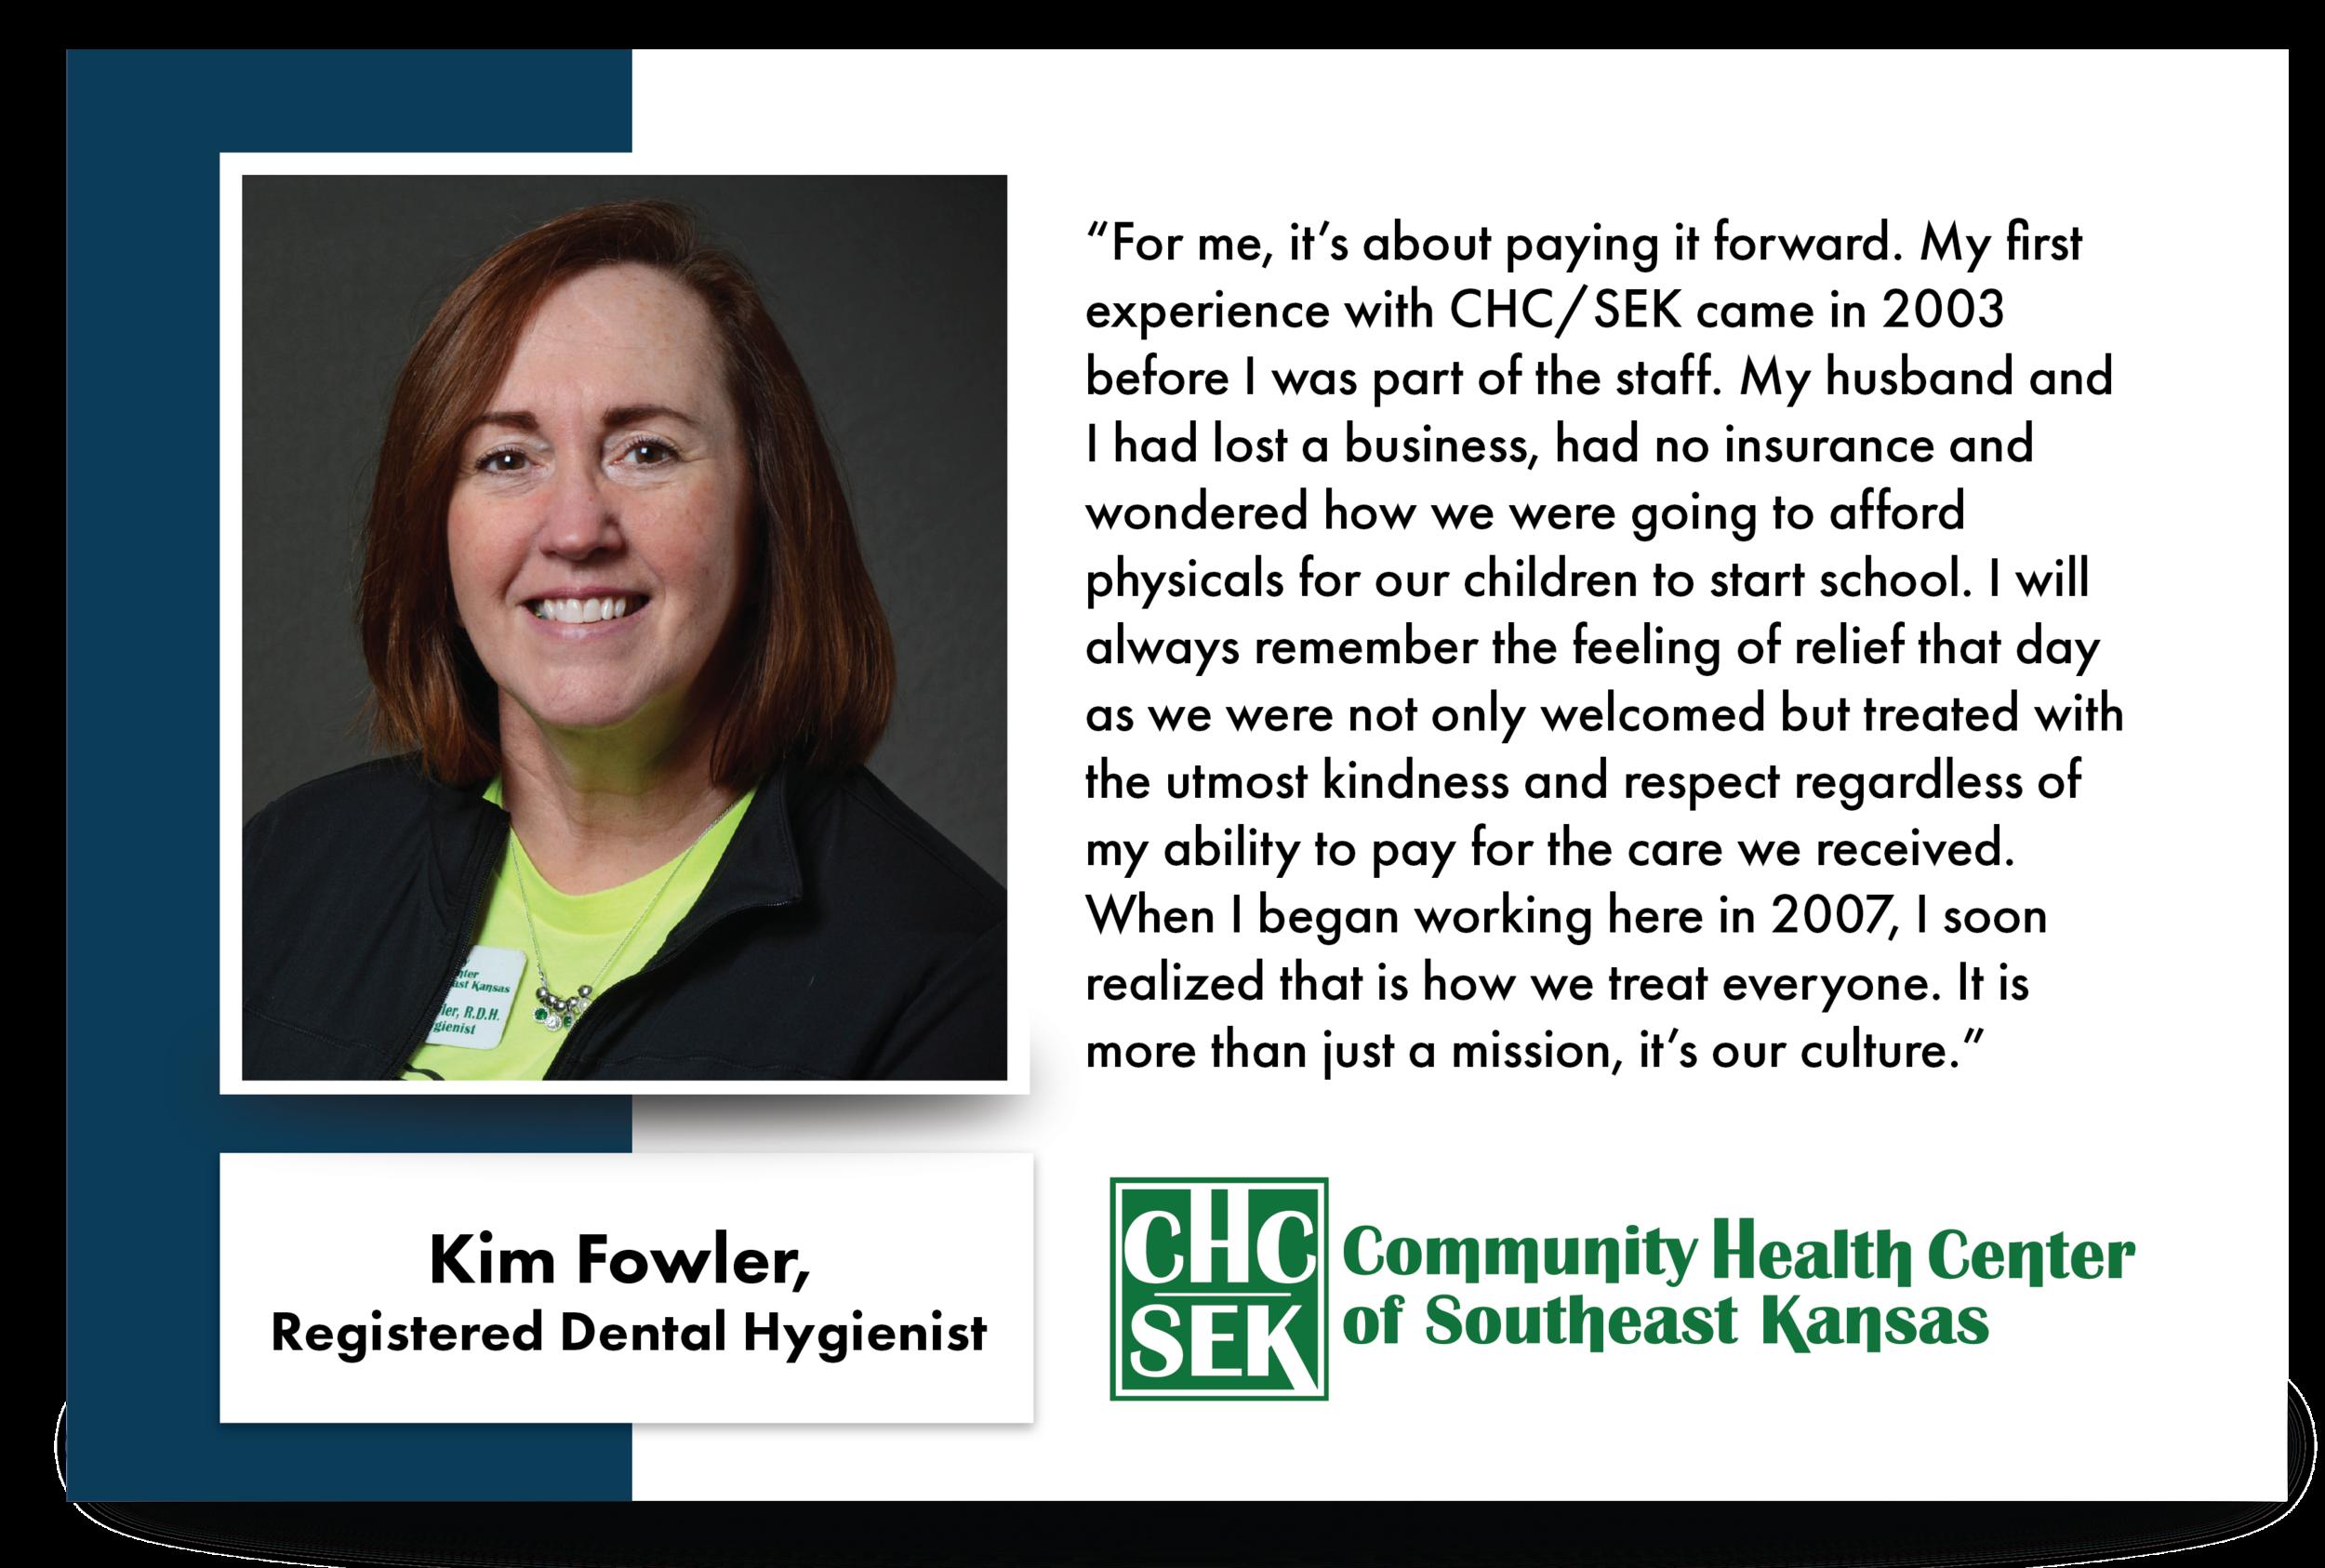 Kim Fowler, CHCSEK Registered Dental Hygienist